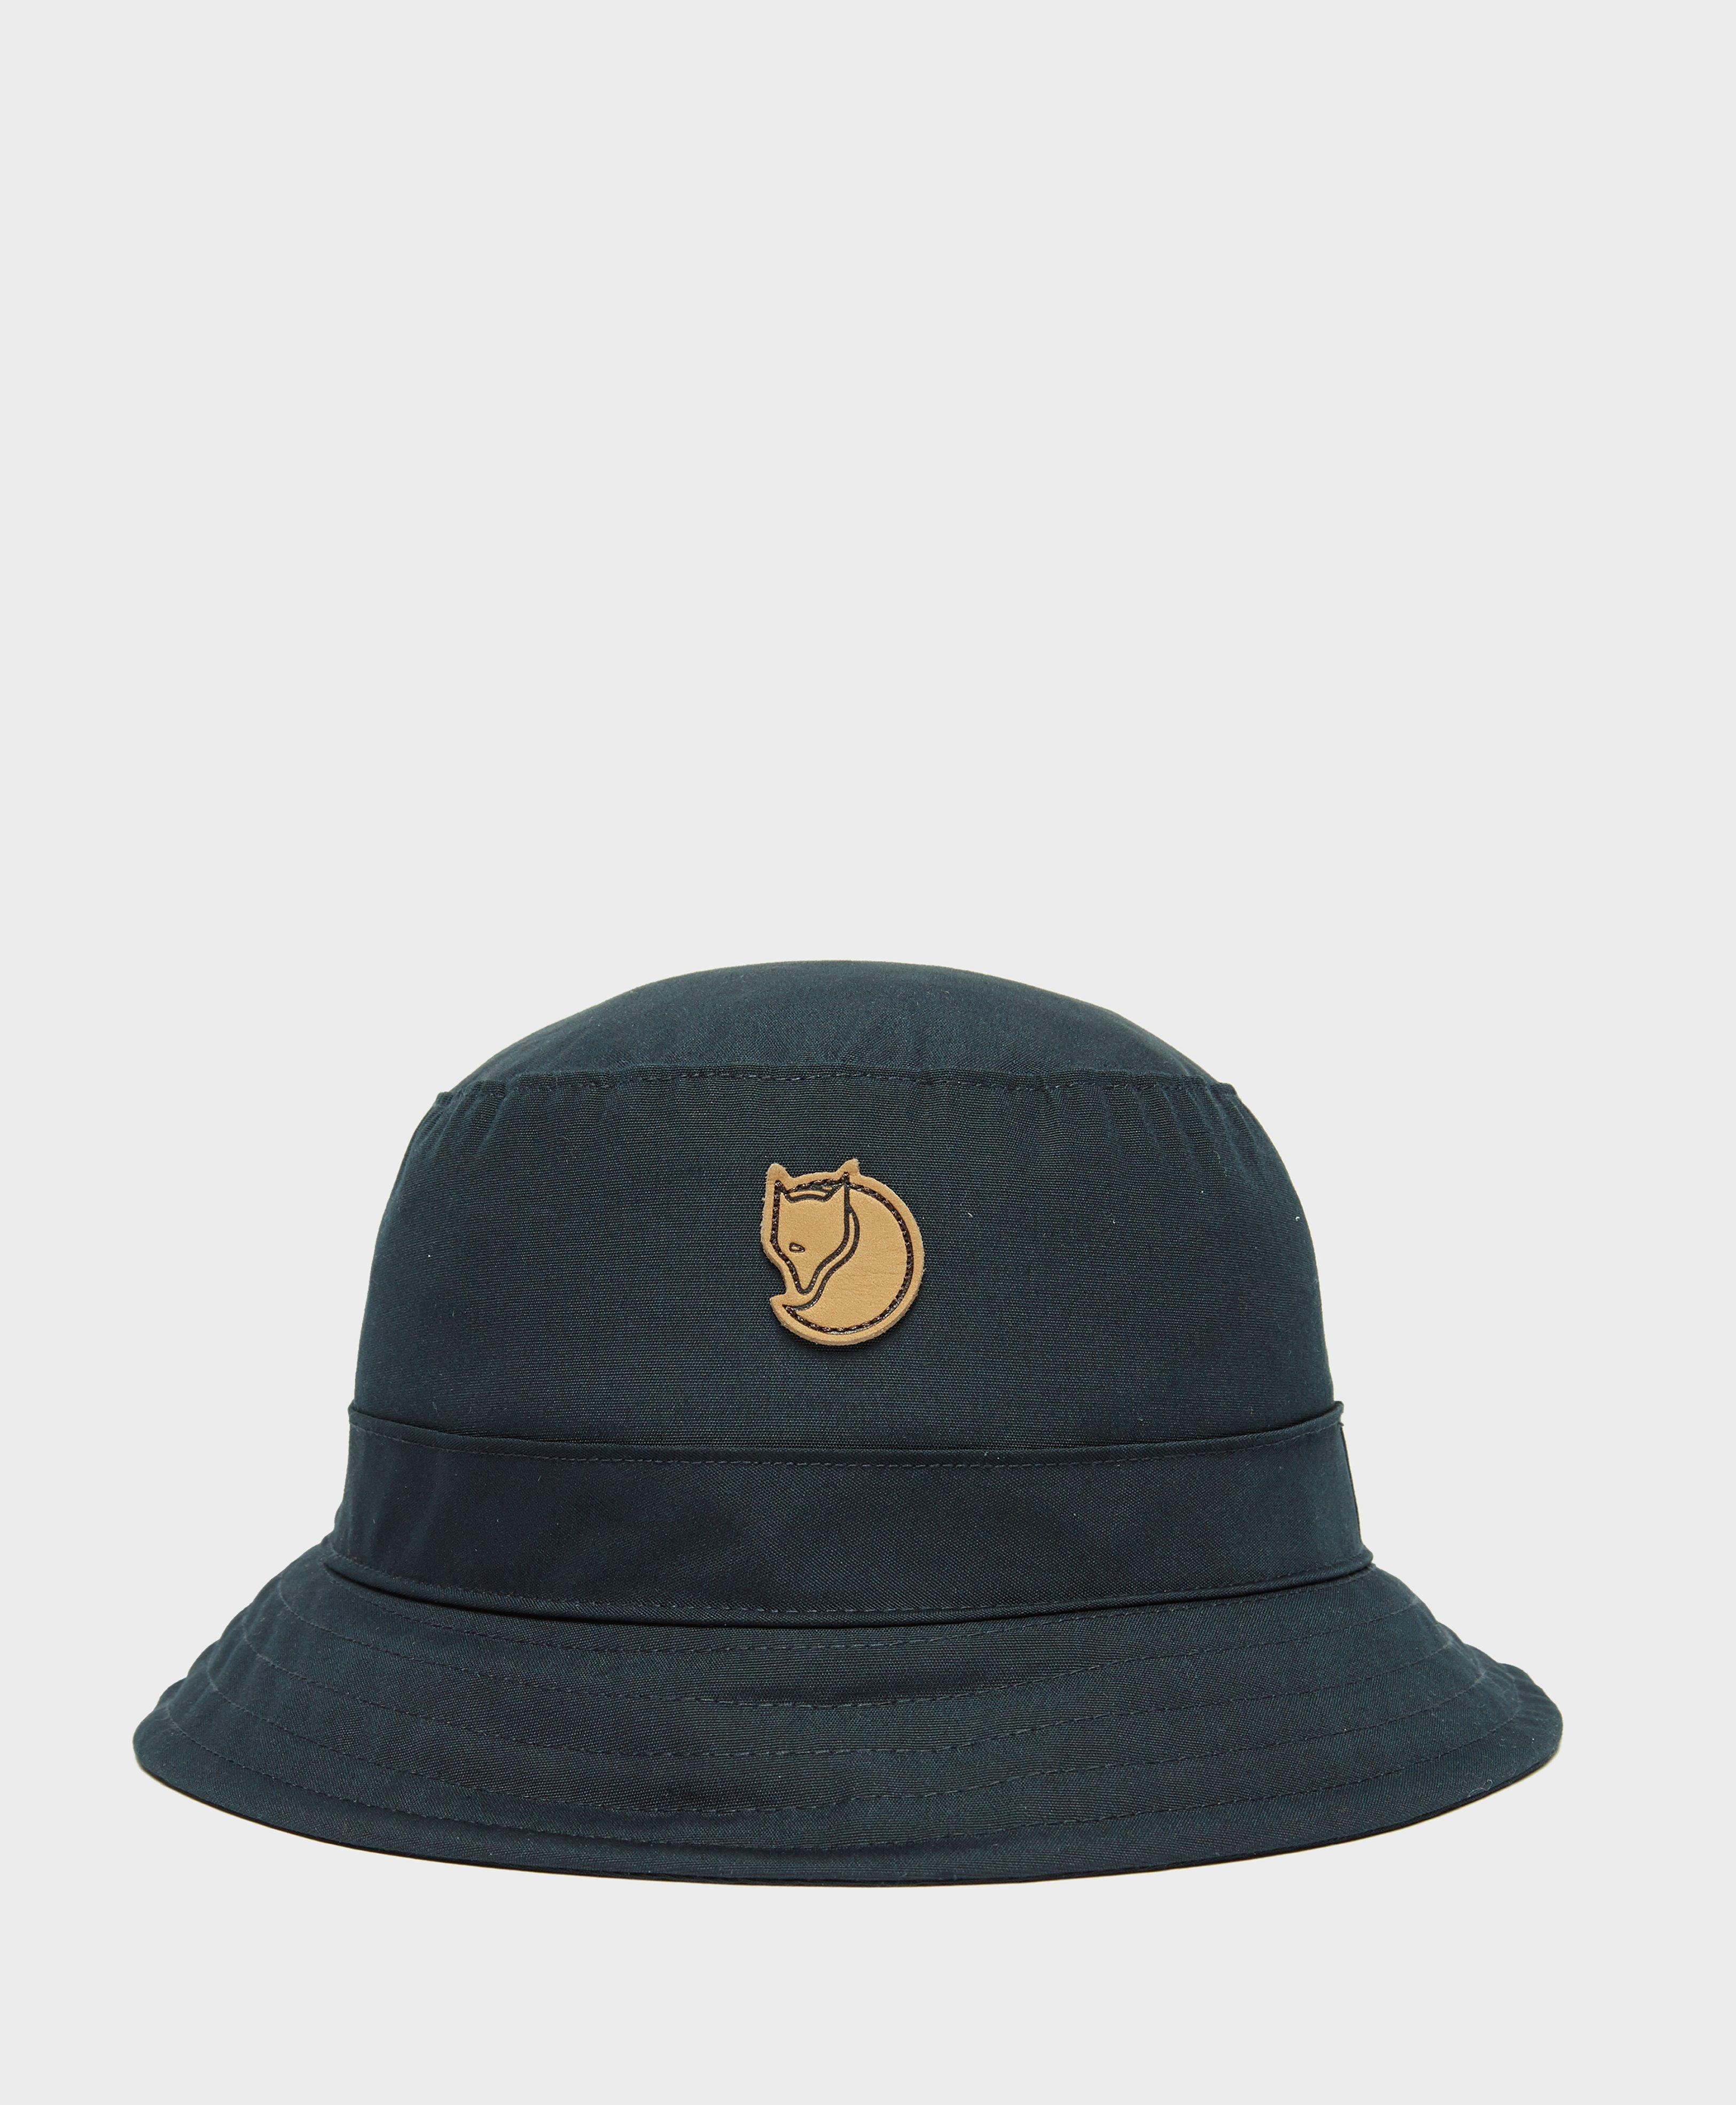 ... Hat  stable quality ddad1 e8757 Bucket Hats - Buy Bucket Hats online -  hatsandcaps.co. ... 4e0bae2cafb3